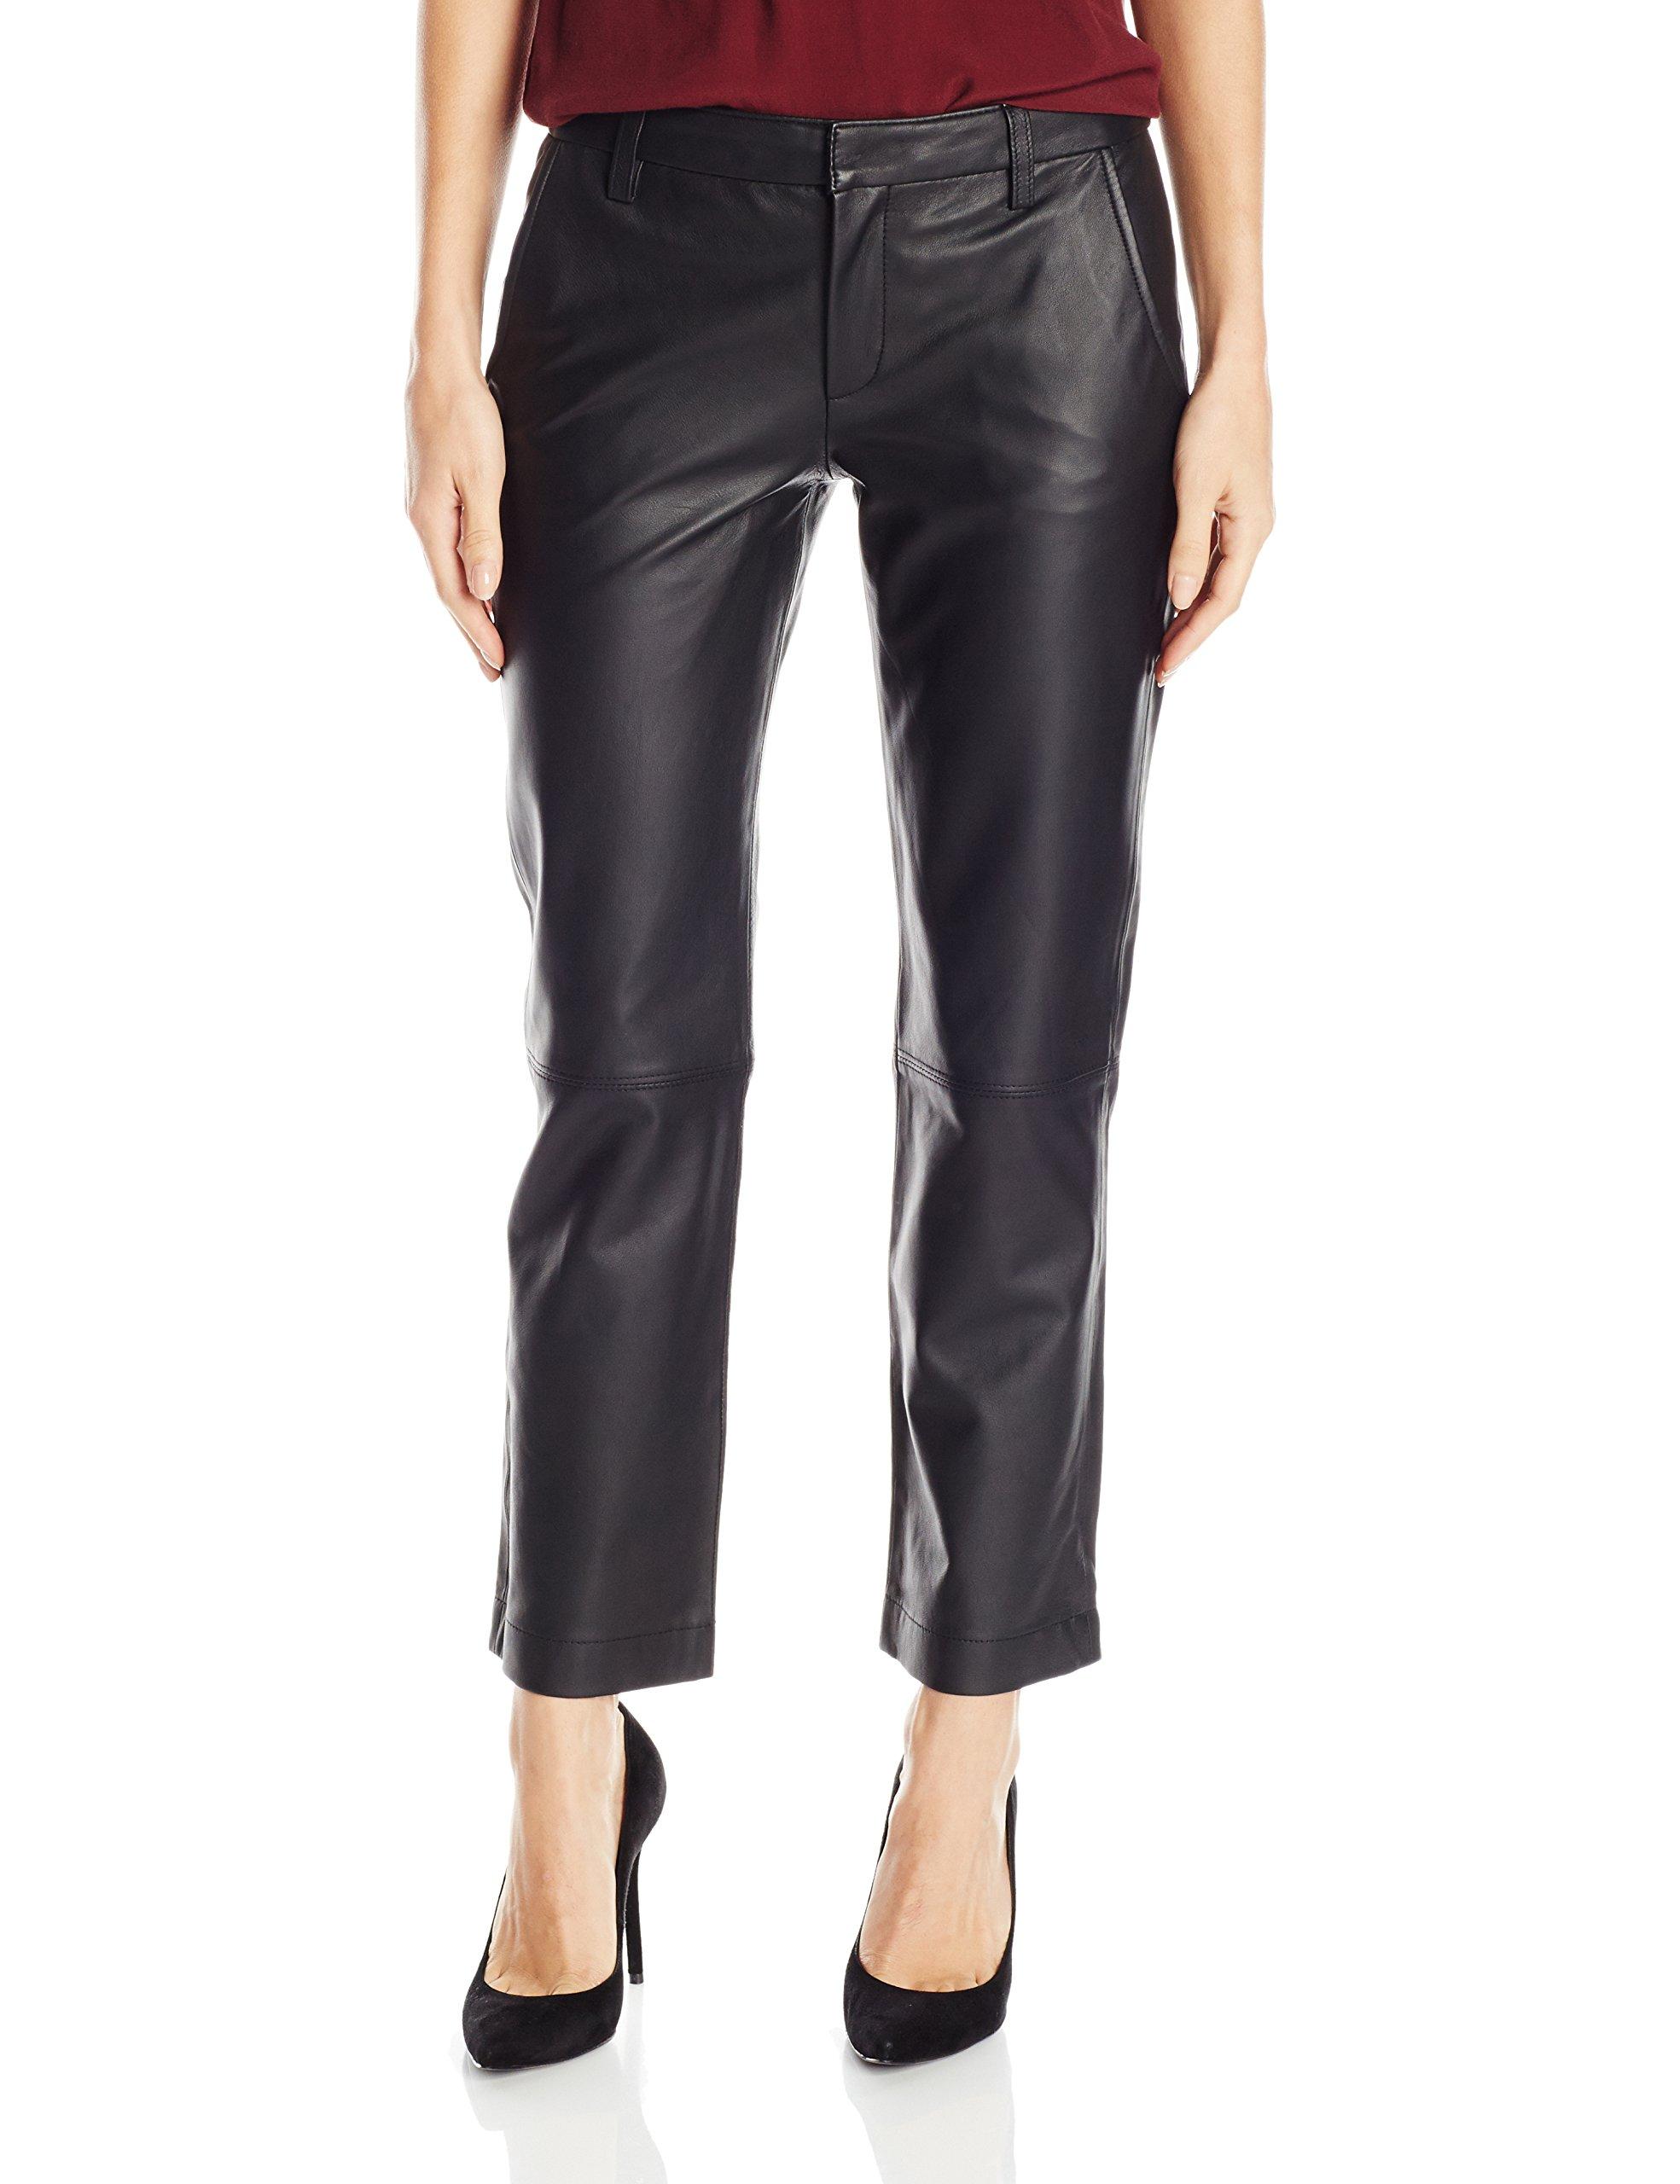 David Lerner Women's Leather Chino, Black, M